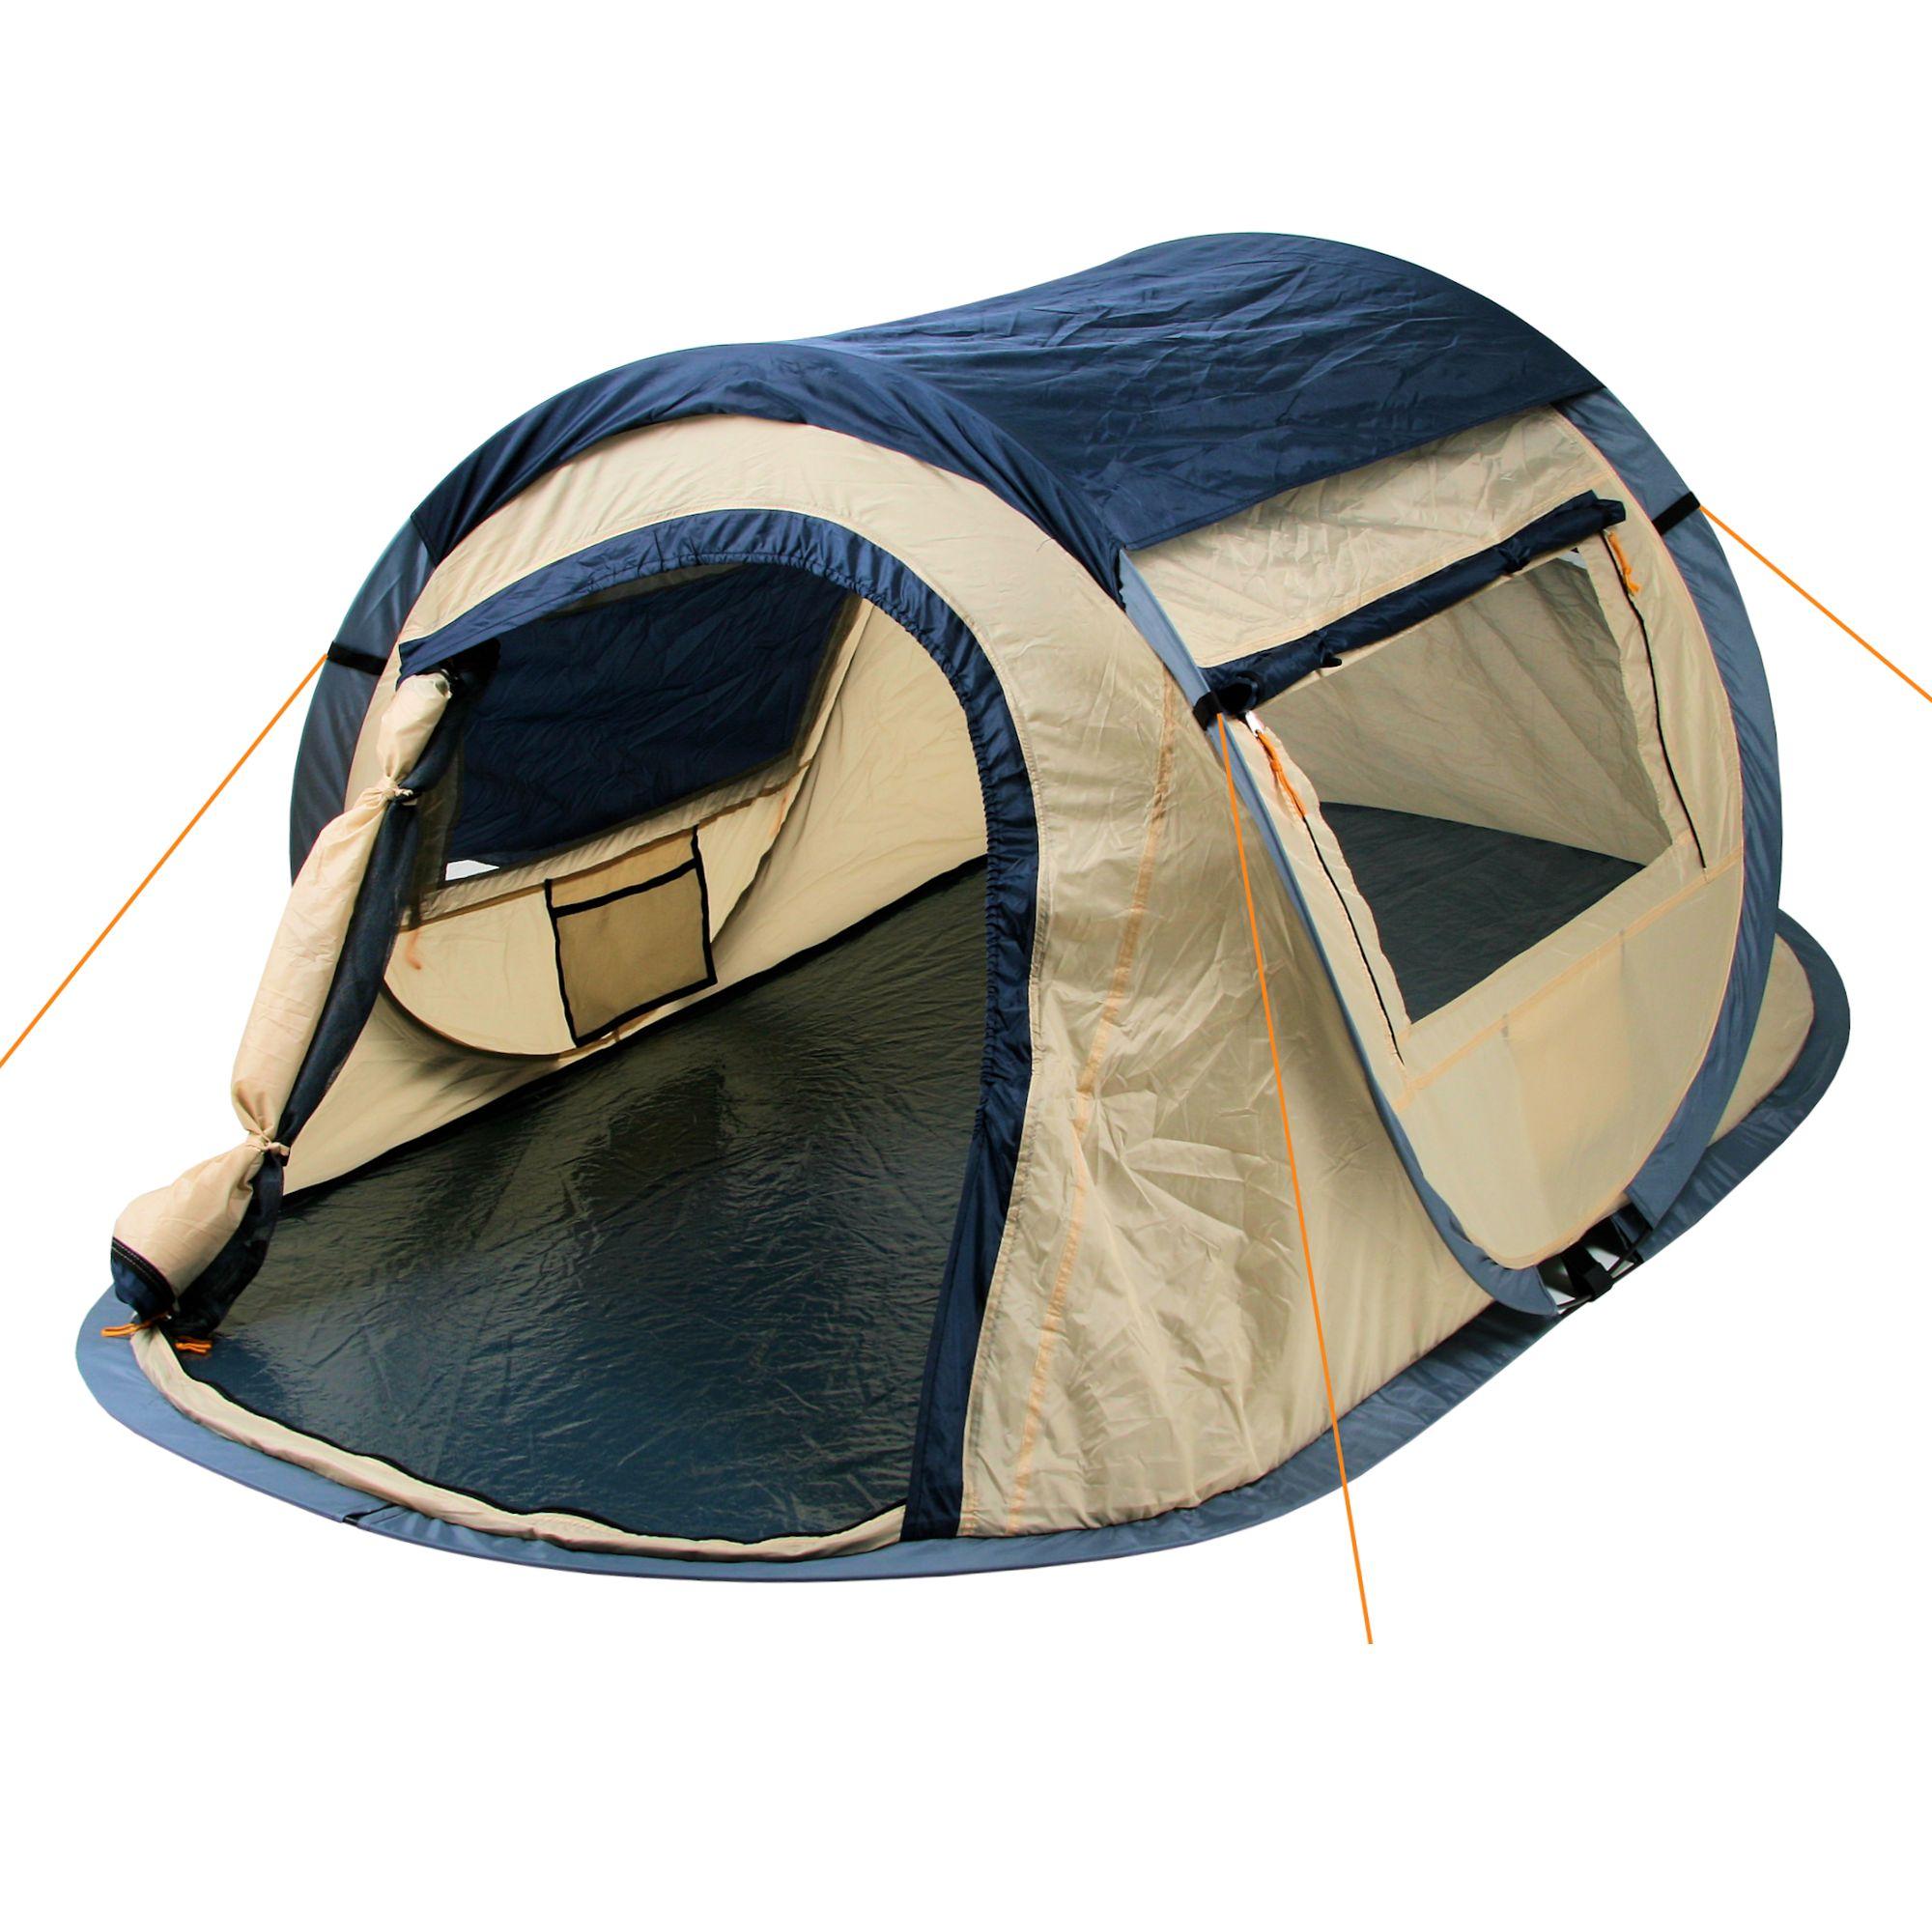 campfeuer pop up zelt wurfzelt automatik quicktent 2 blau ebay. Black Bedroom Furniture Sets. Home Design Ideas